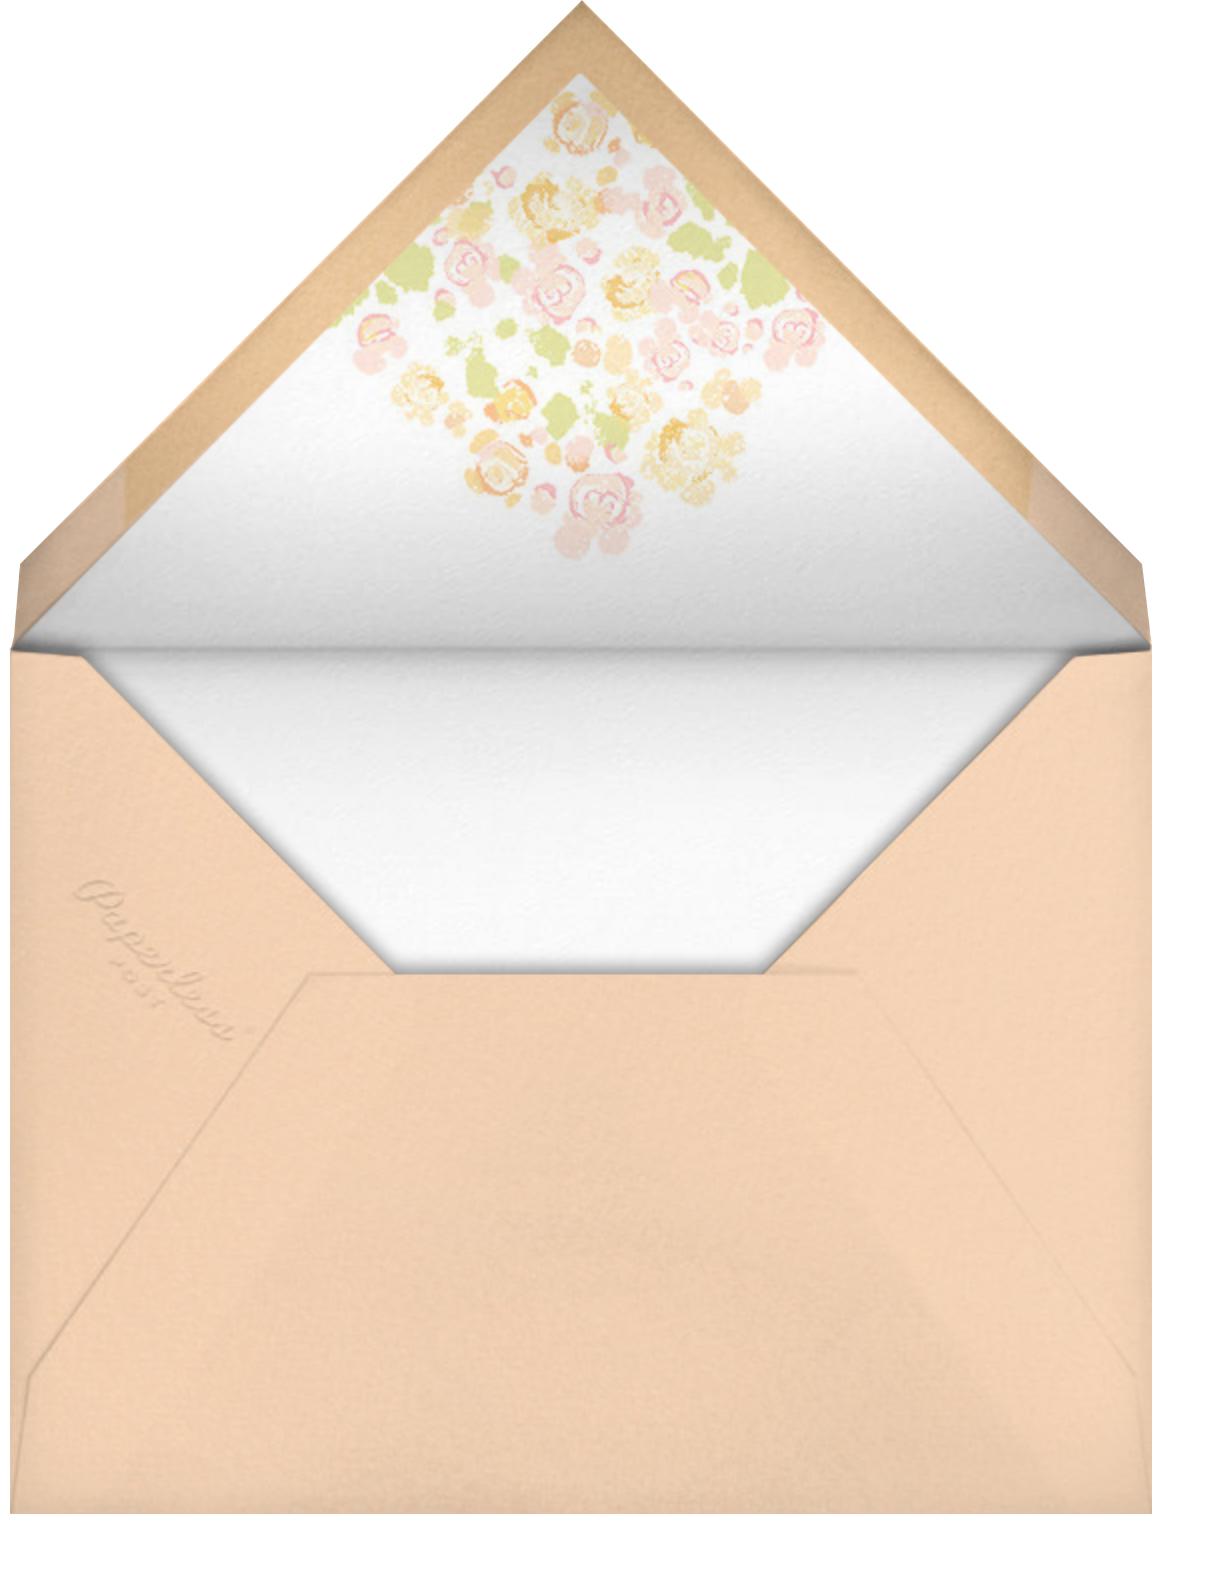 Something Gold - Paperless Post - Bridal shower - envelope back